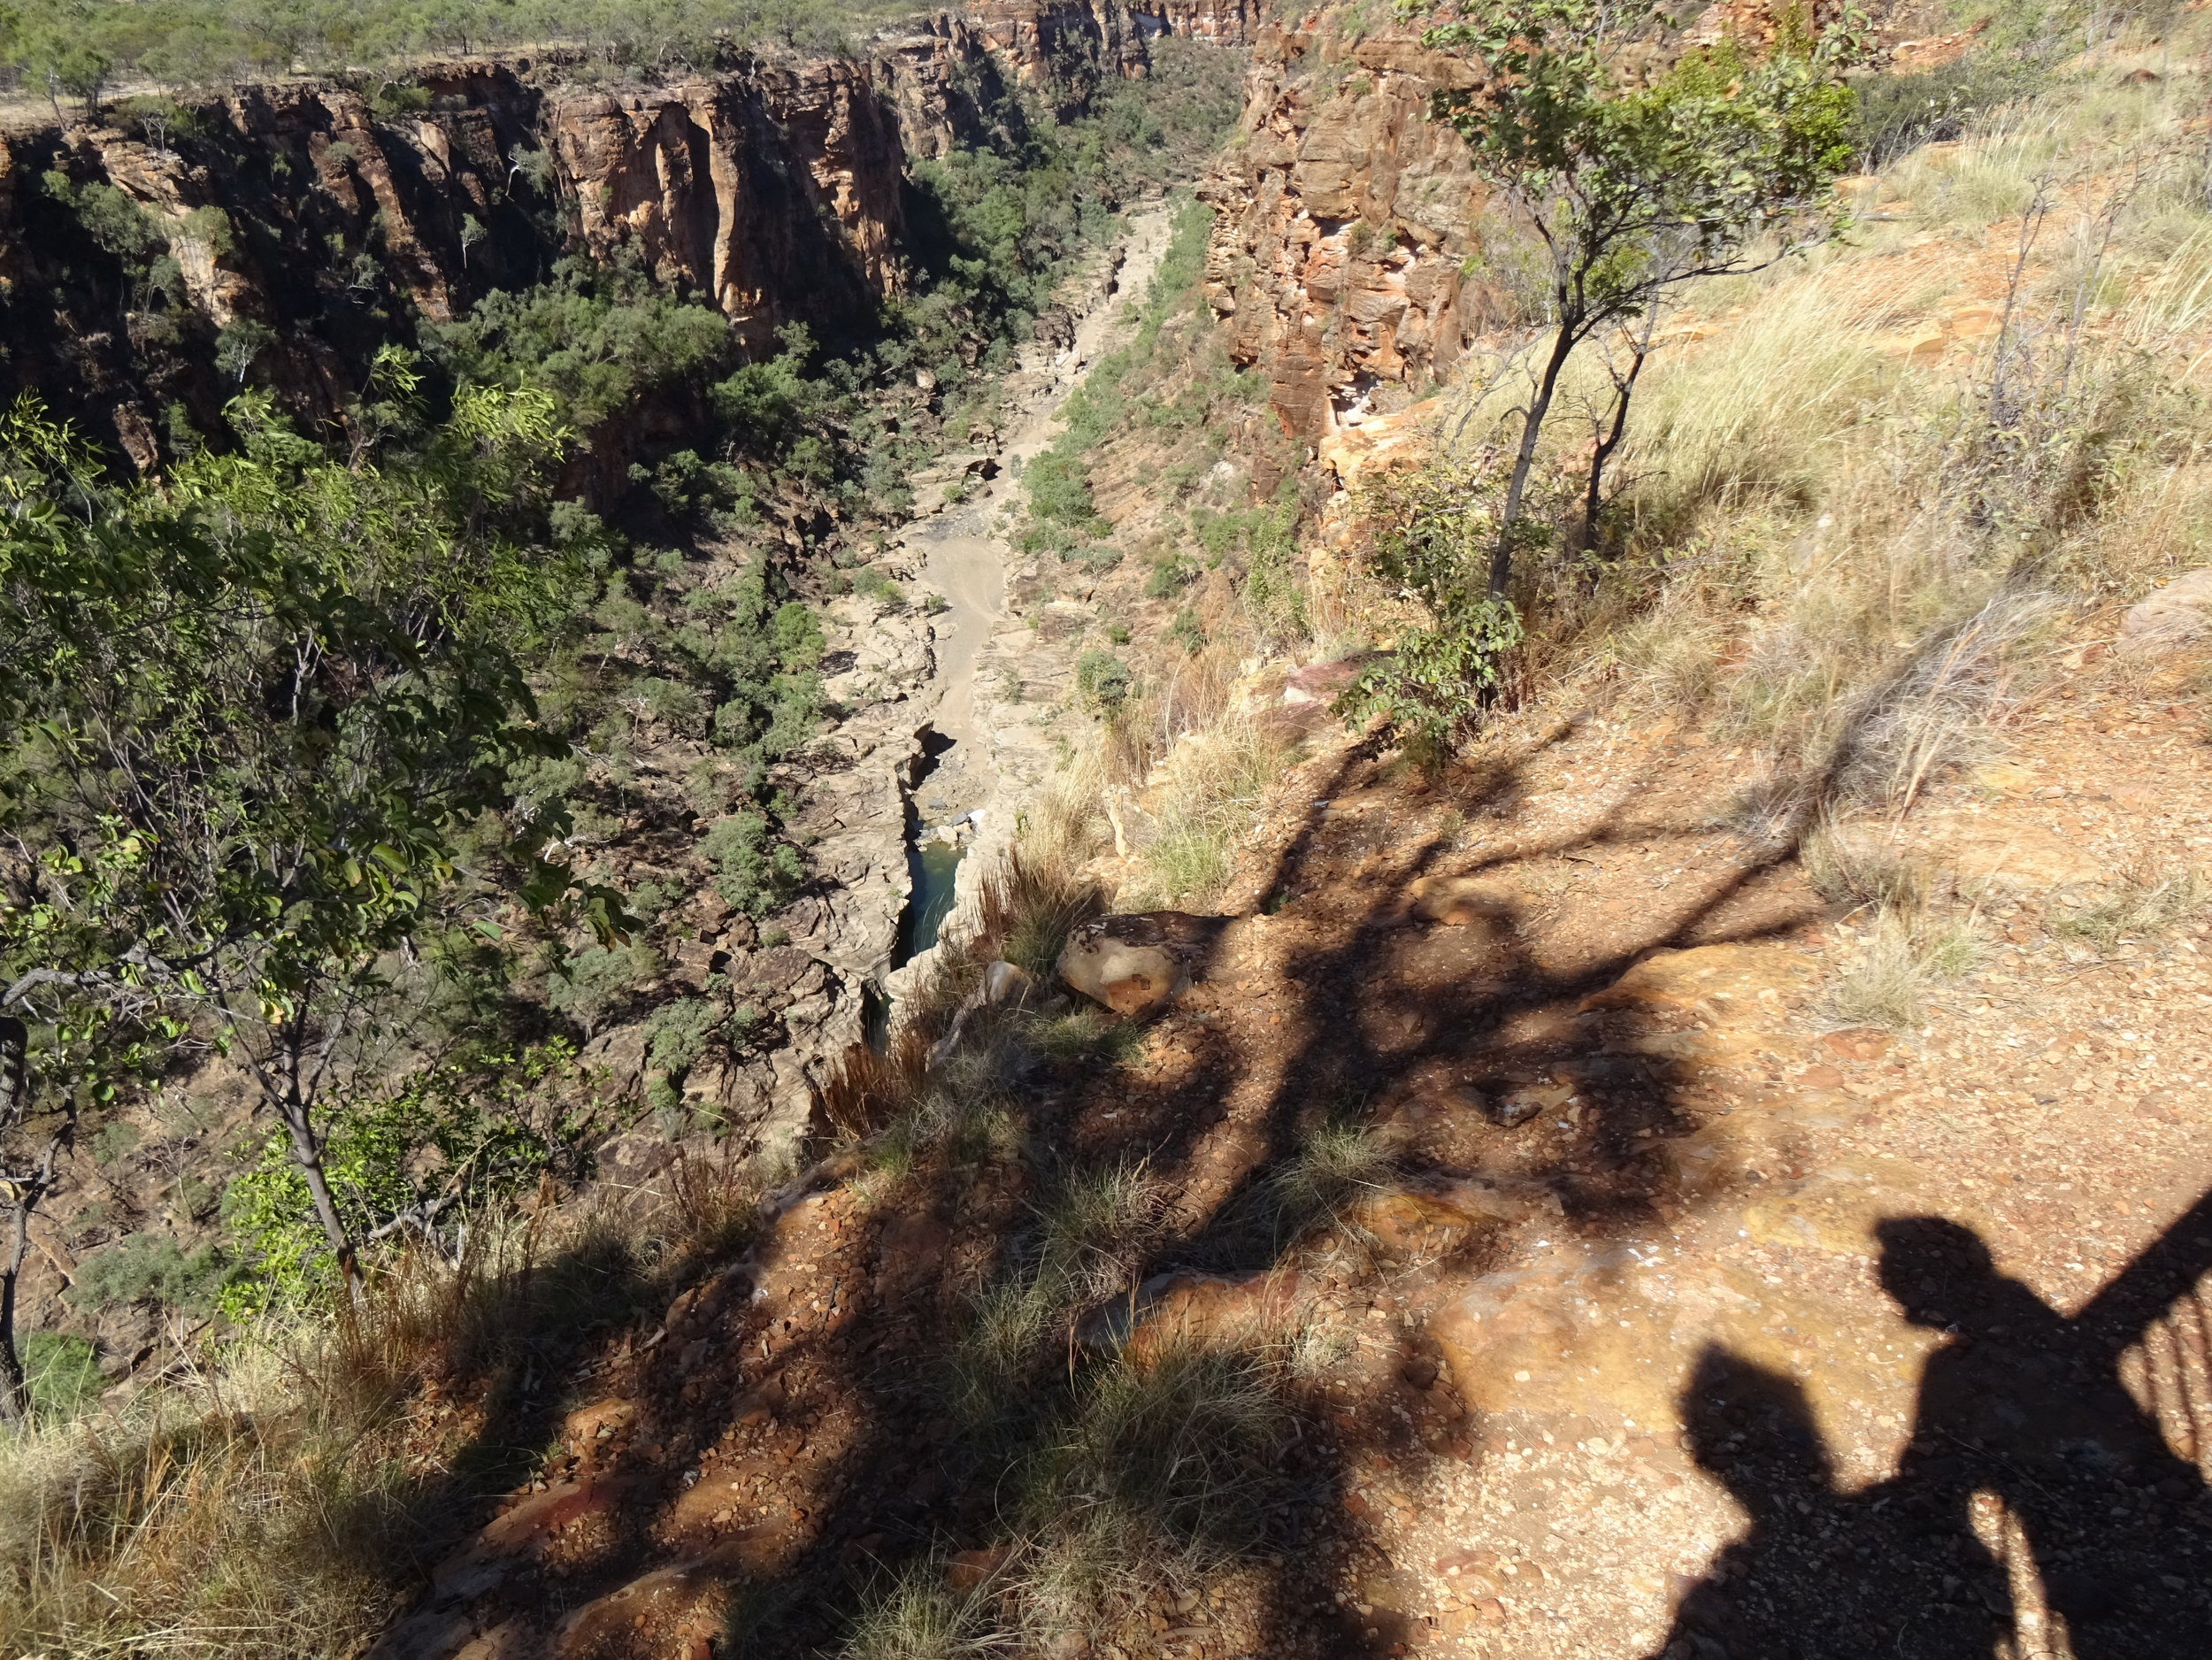 Qld, Porcupine Gorge